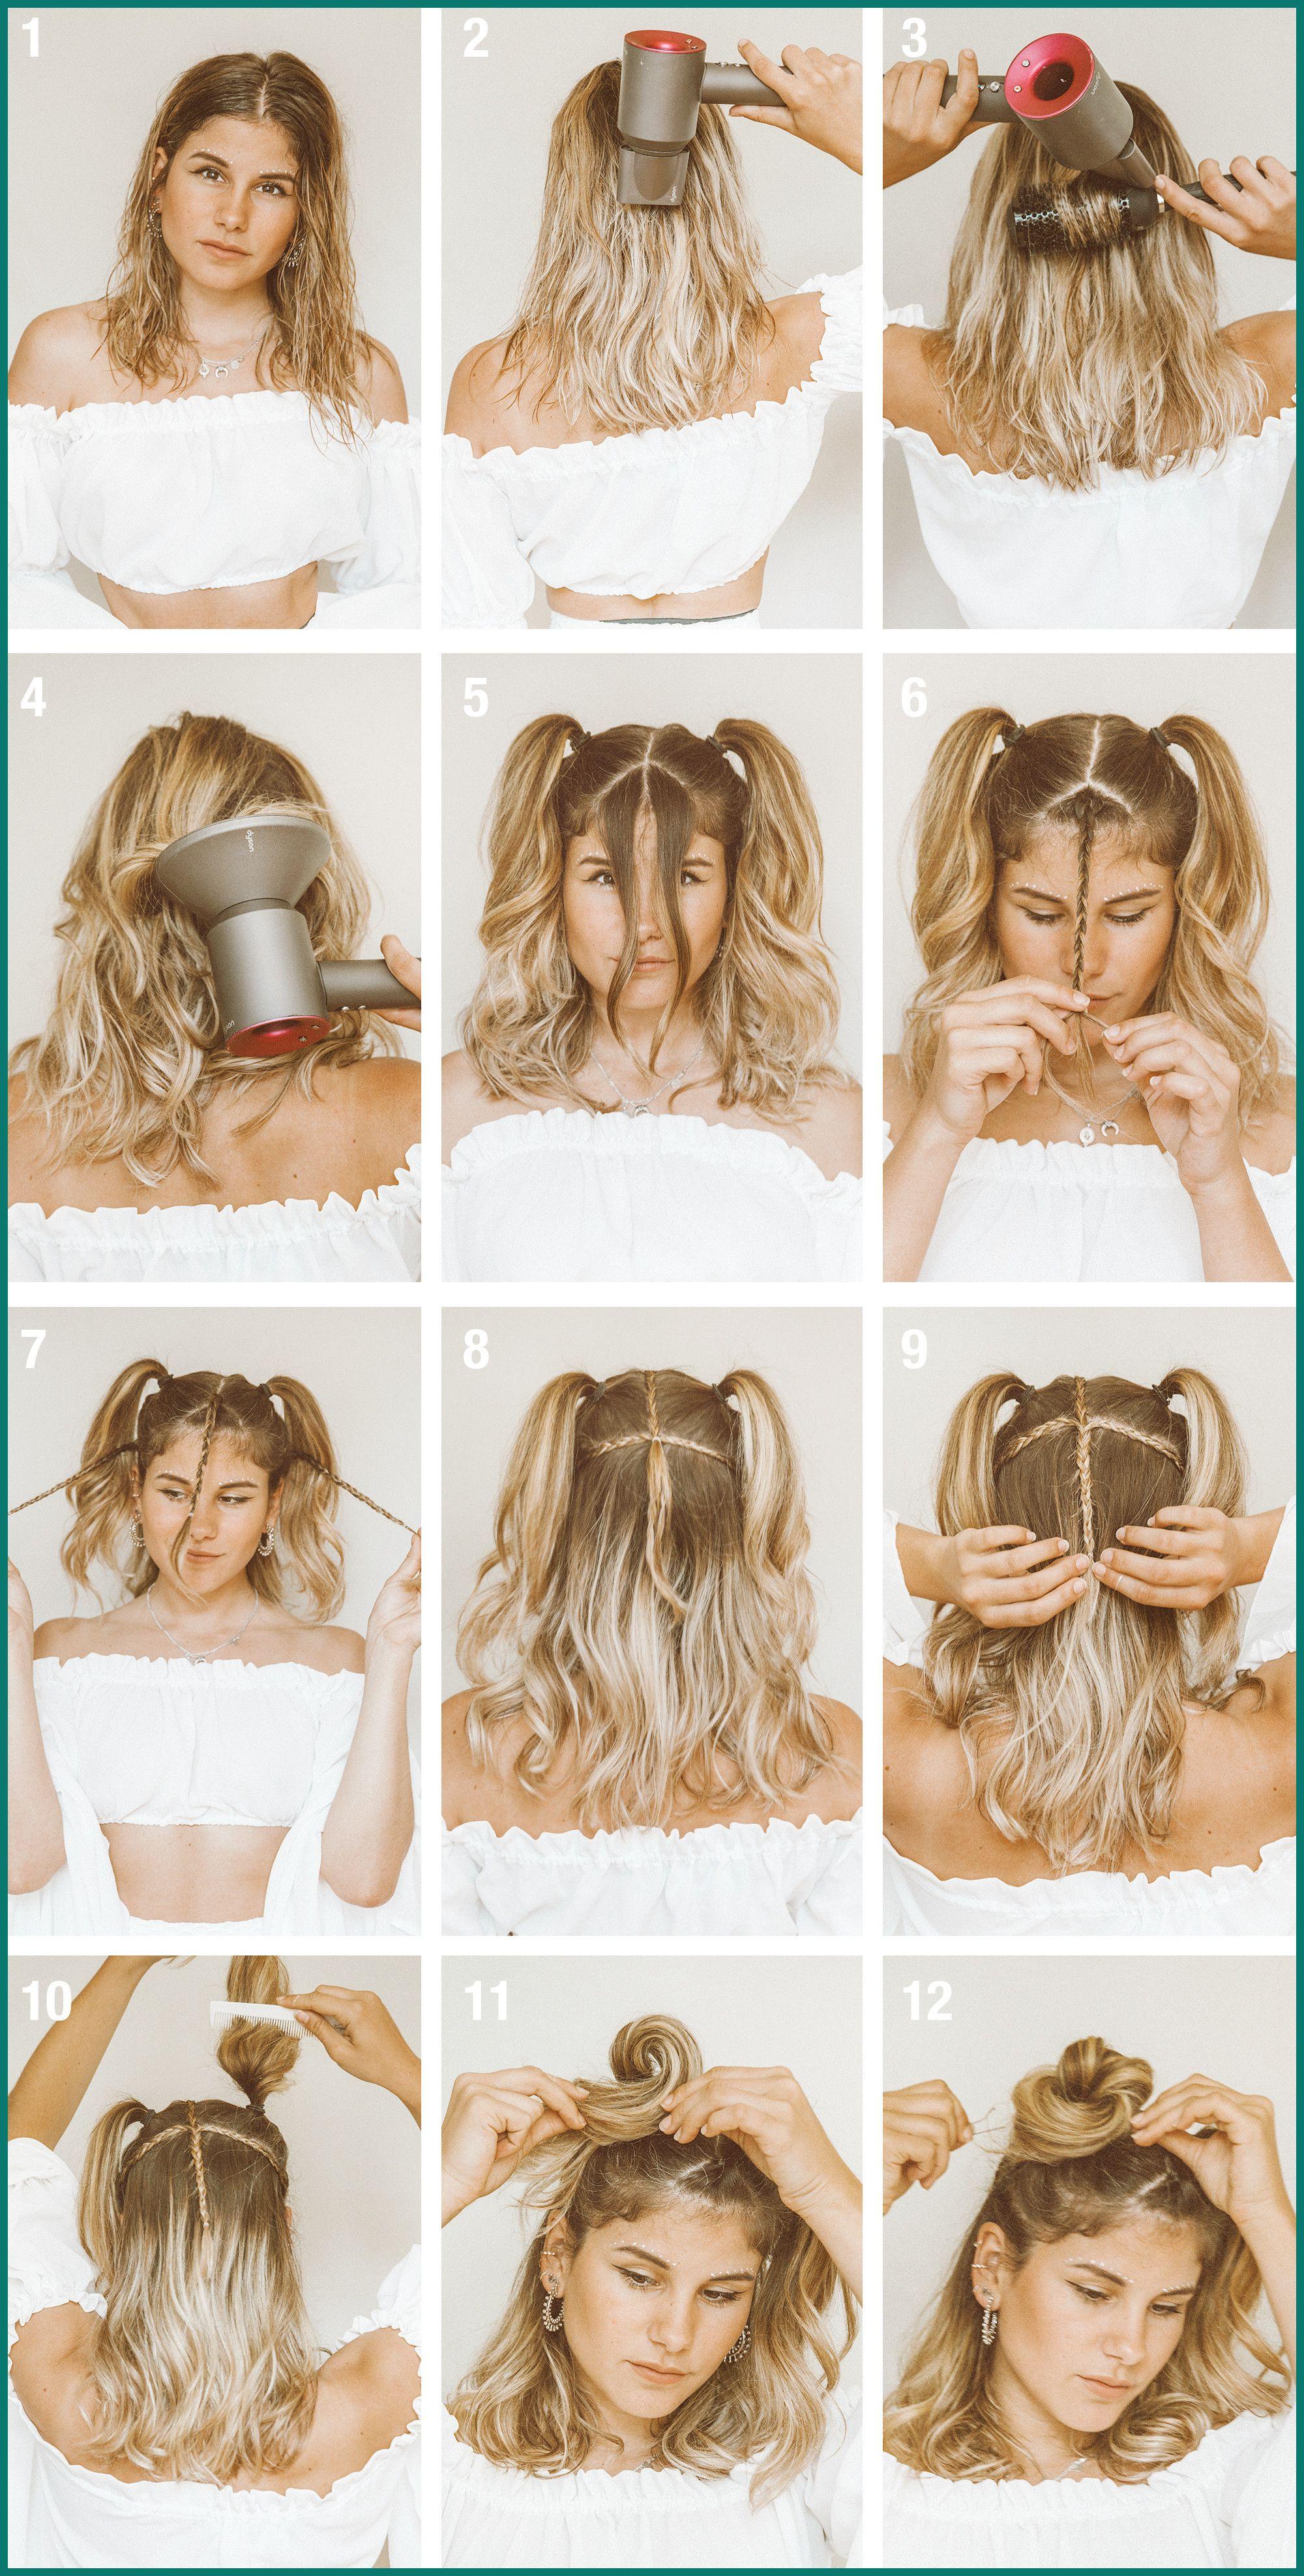 Easy Hairstyles For Short Hair Tutorials Dye In 2020 Short Hair Styles Easy Cute Simple Hairstyles Short Hair Tutorial